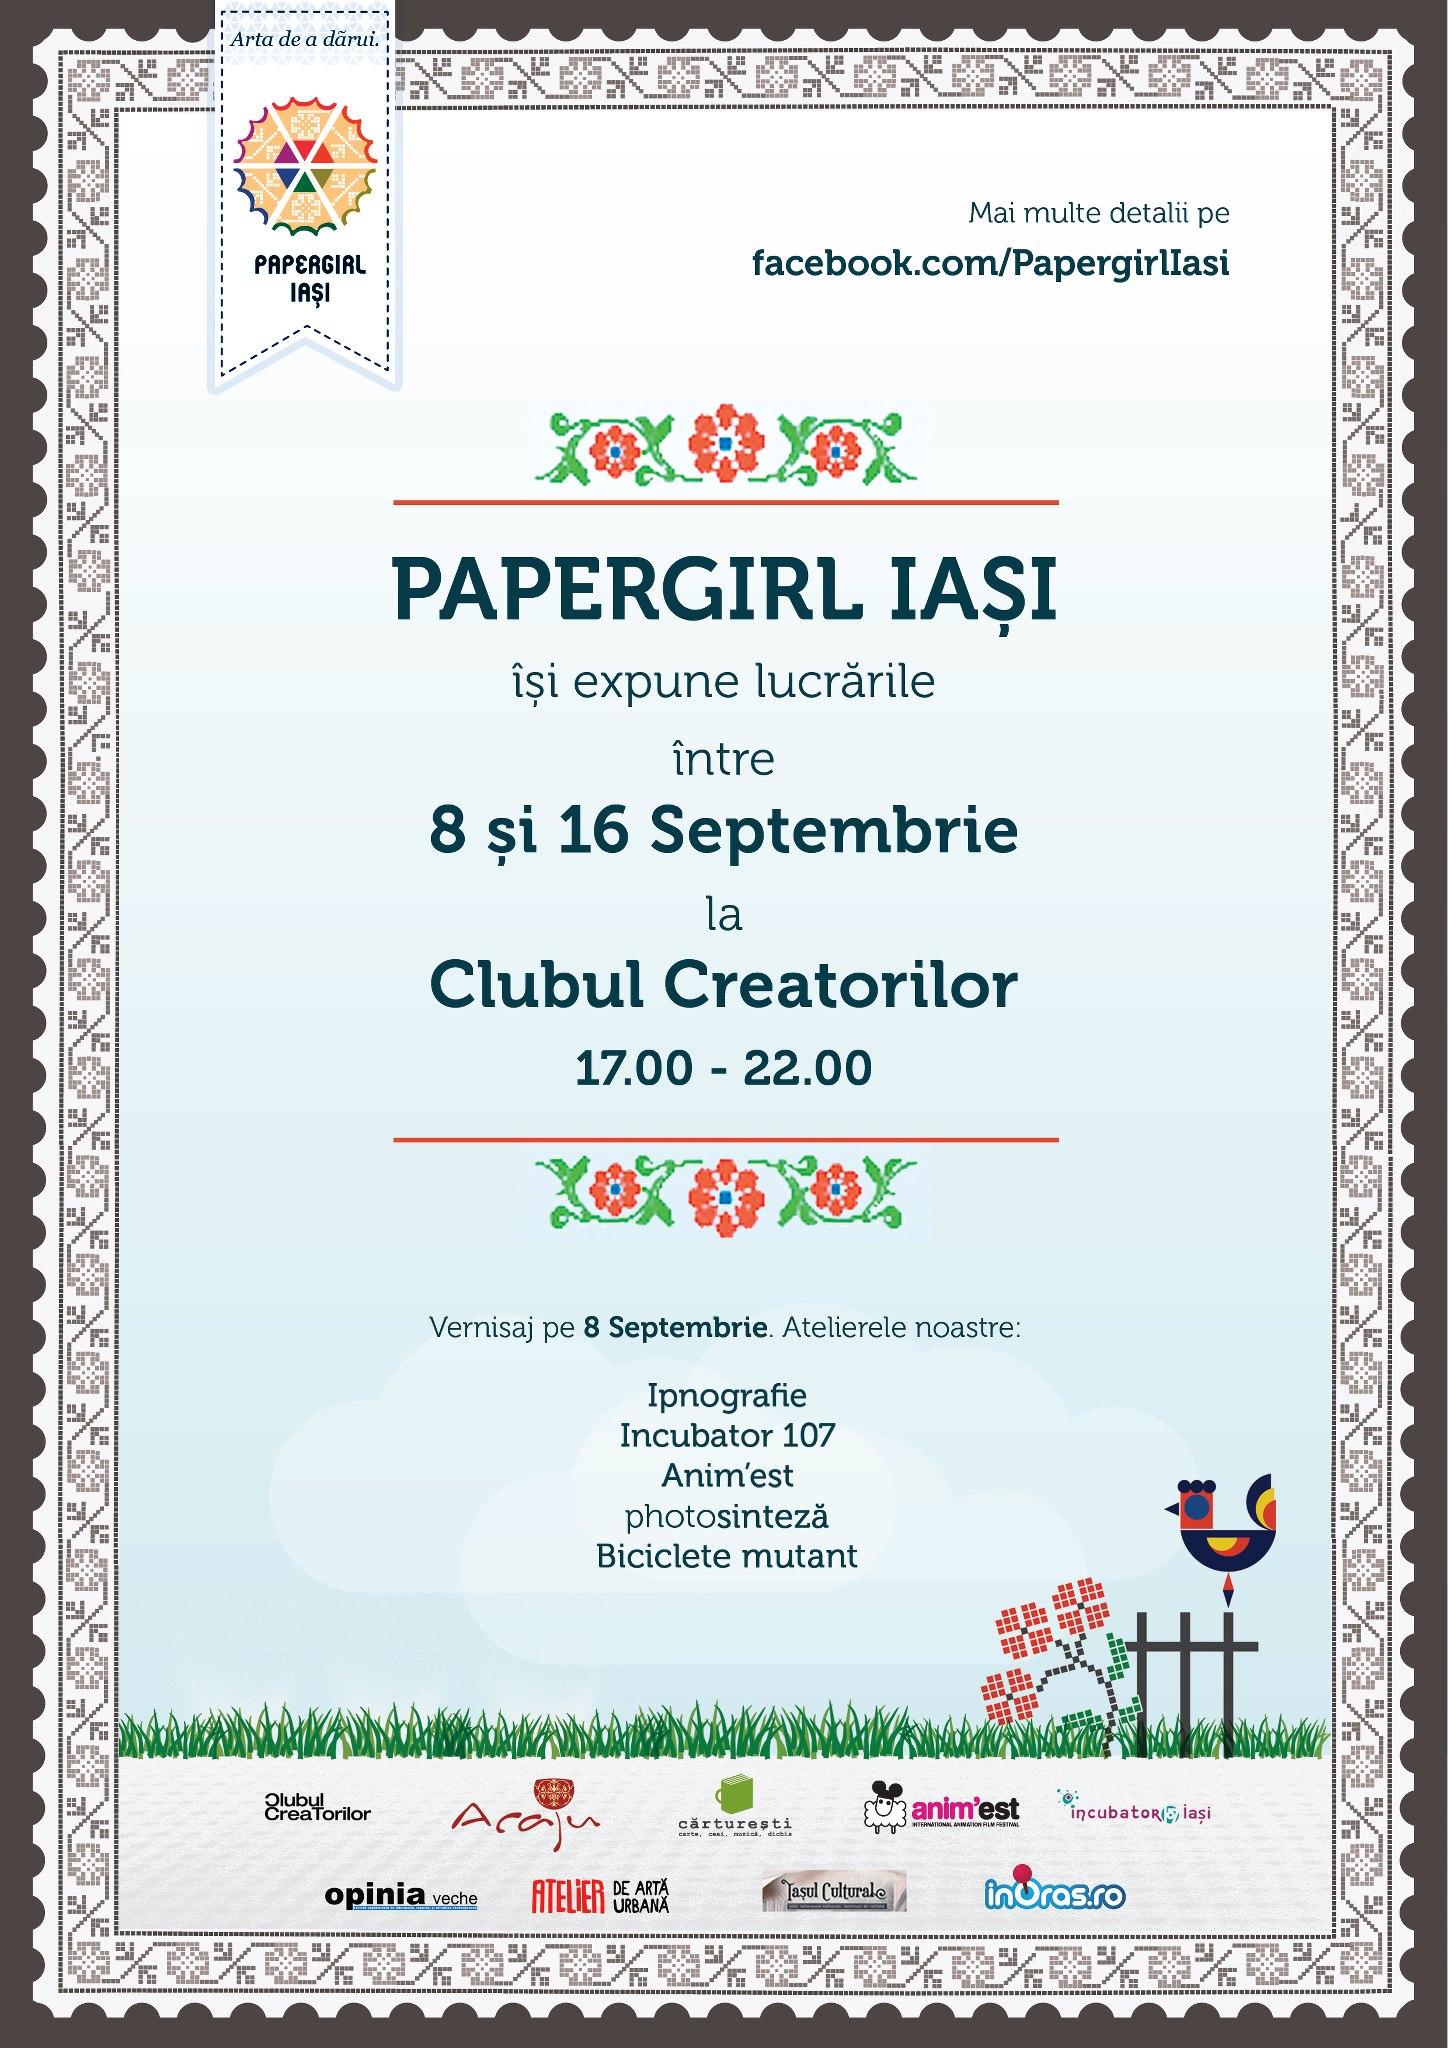 Expoziția Papergirl Iasi #3